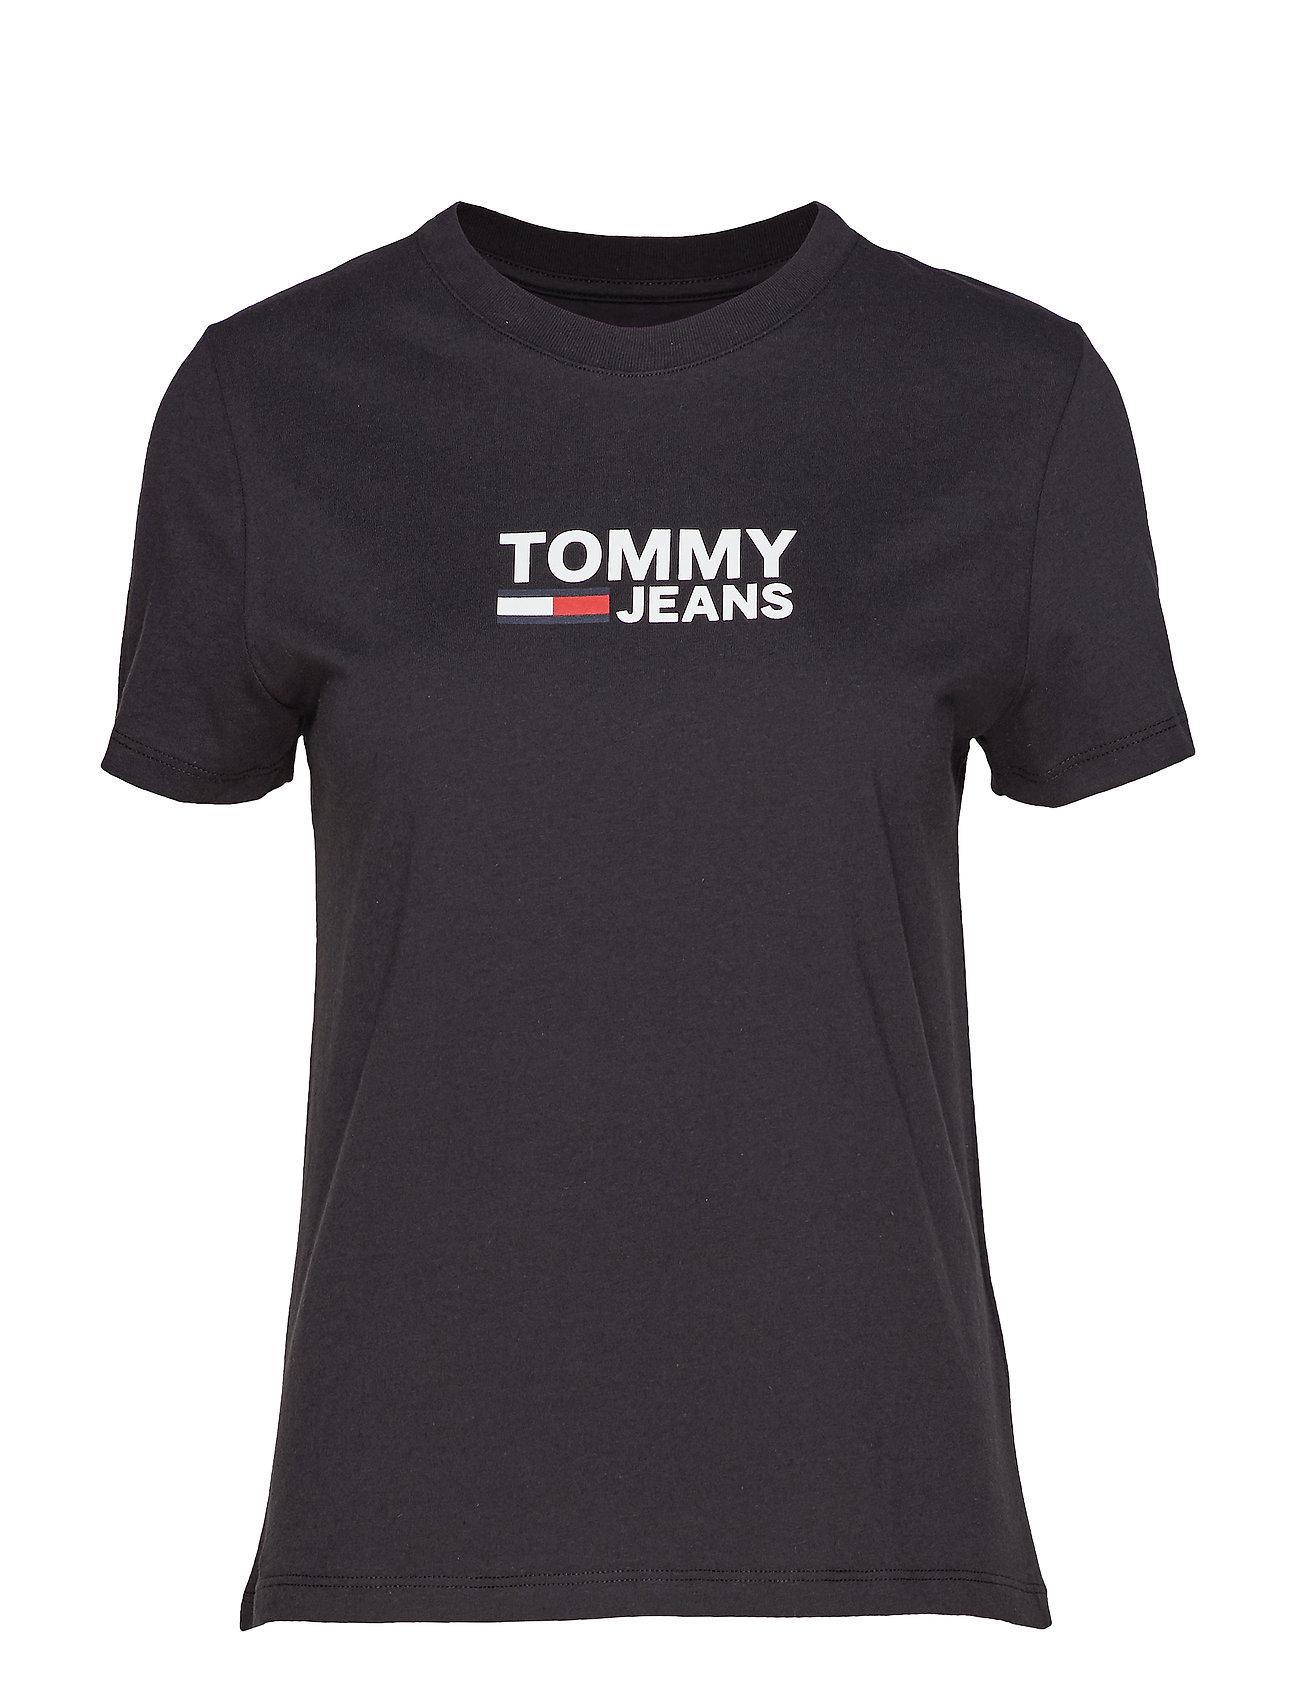 Tommy Jeans TJW CORP LOGO TEE - TOMMY BLACK